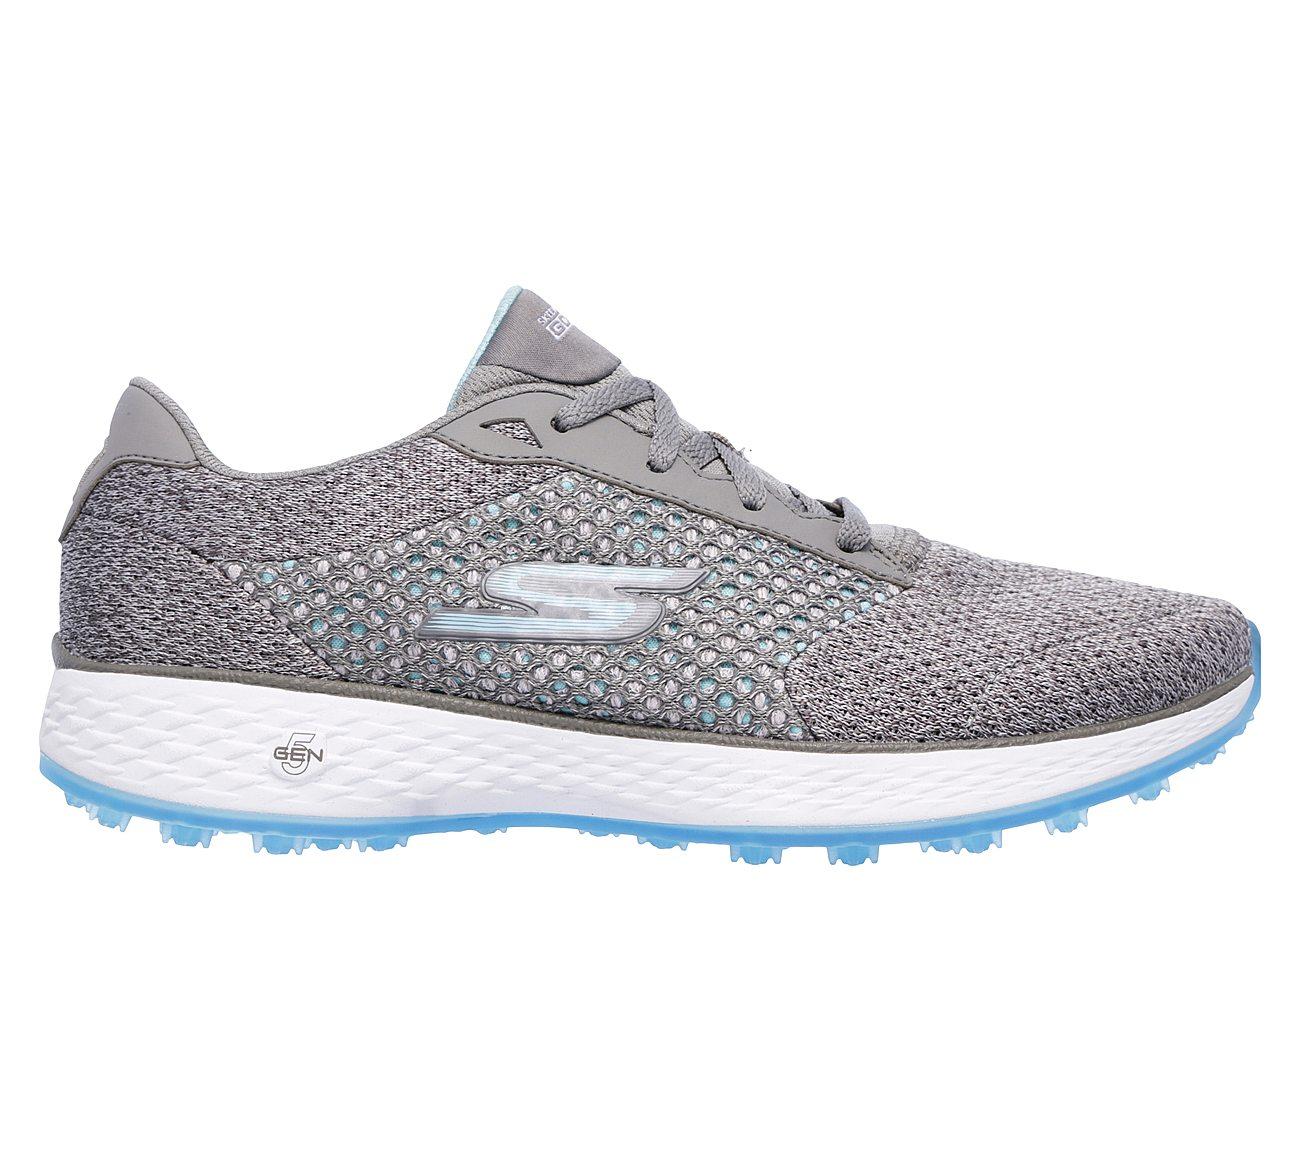 Skechers Performance Shoes GOwalk 3 - Complete Lace-Up Grey & Aqua Model:0614